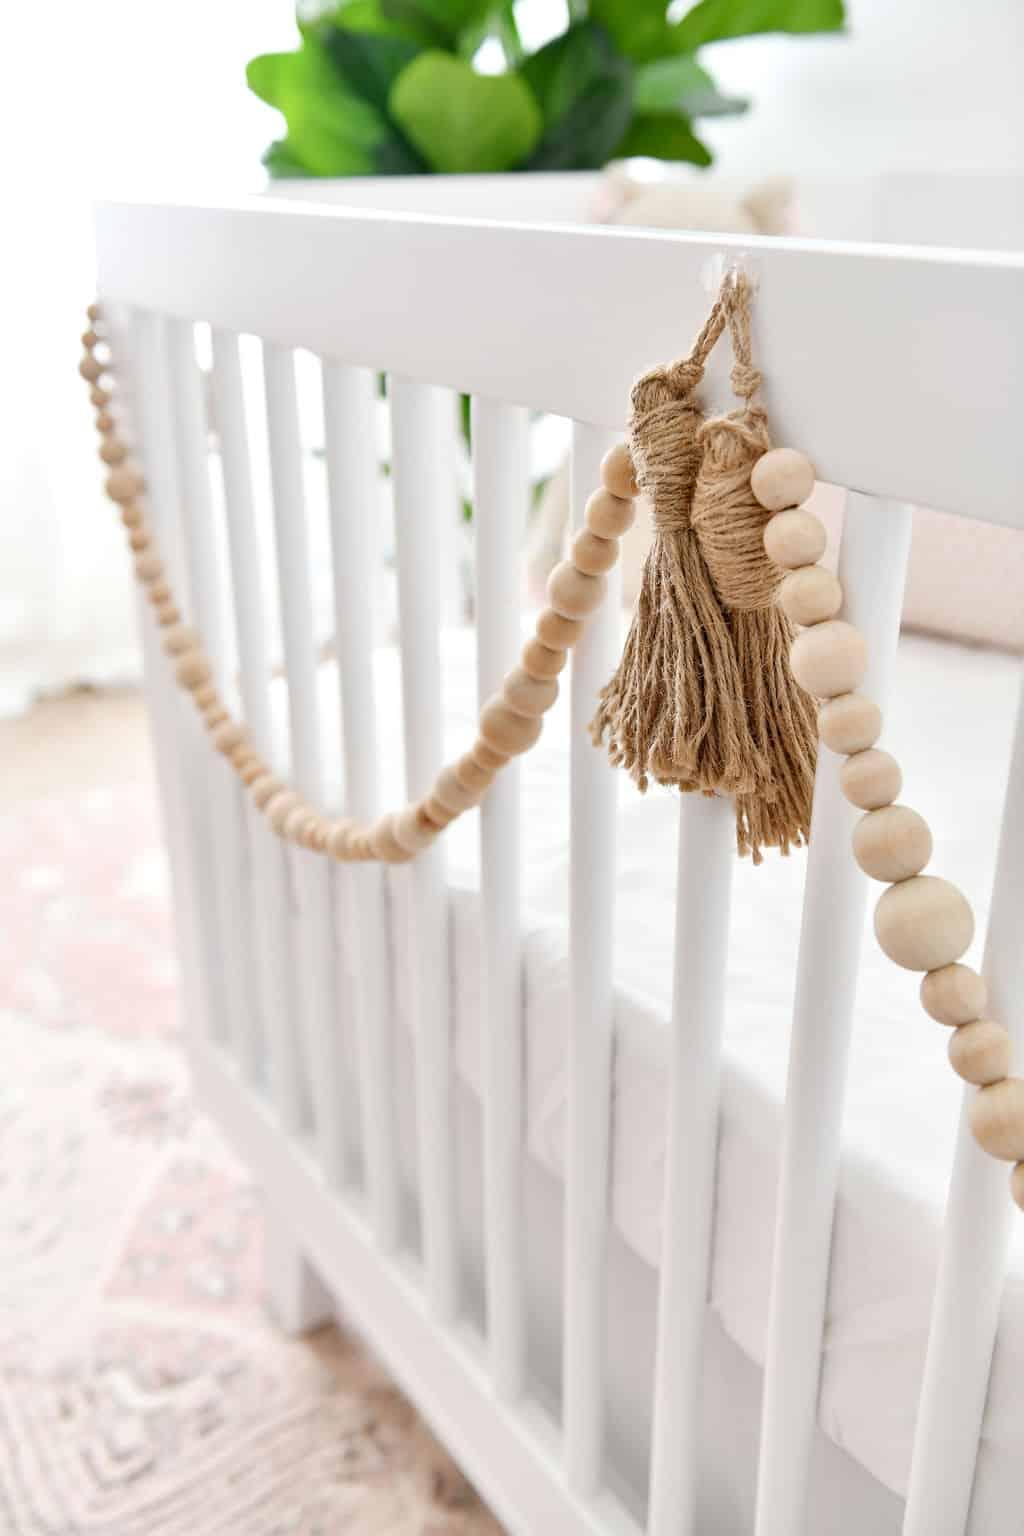 Wood beads on crib